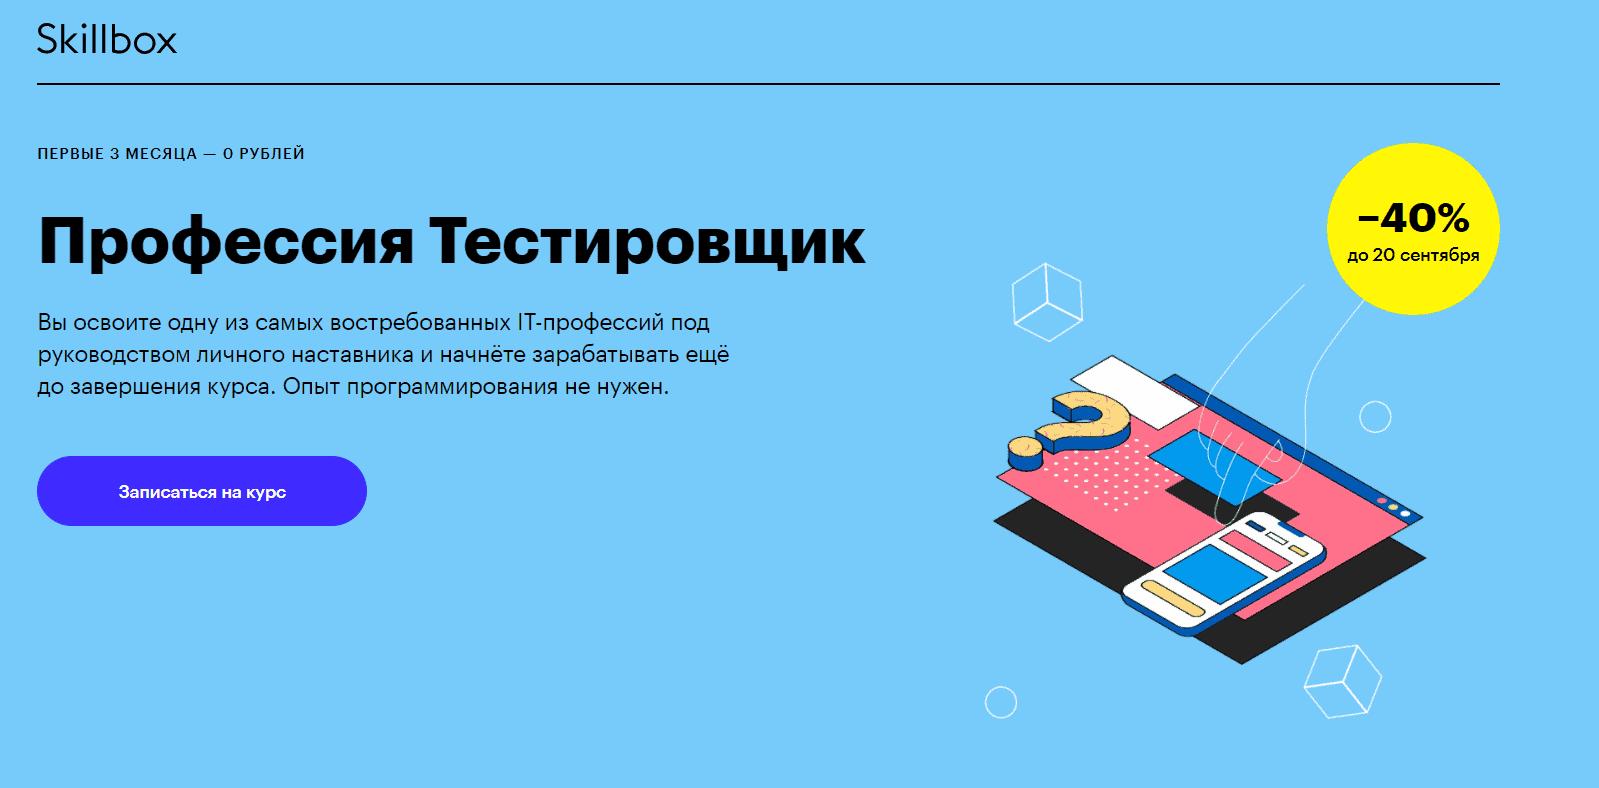 Профессия Тестировщик от Skillbox